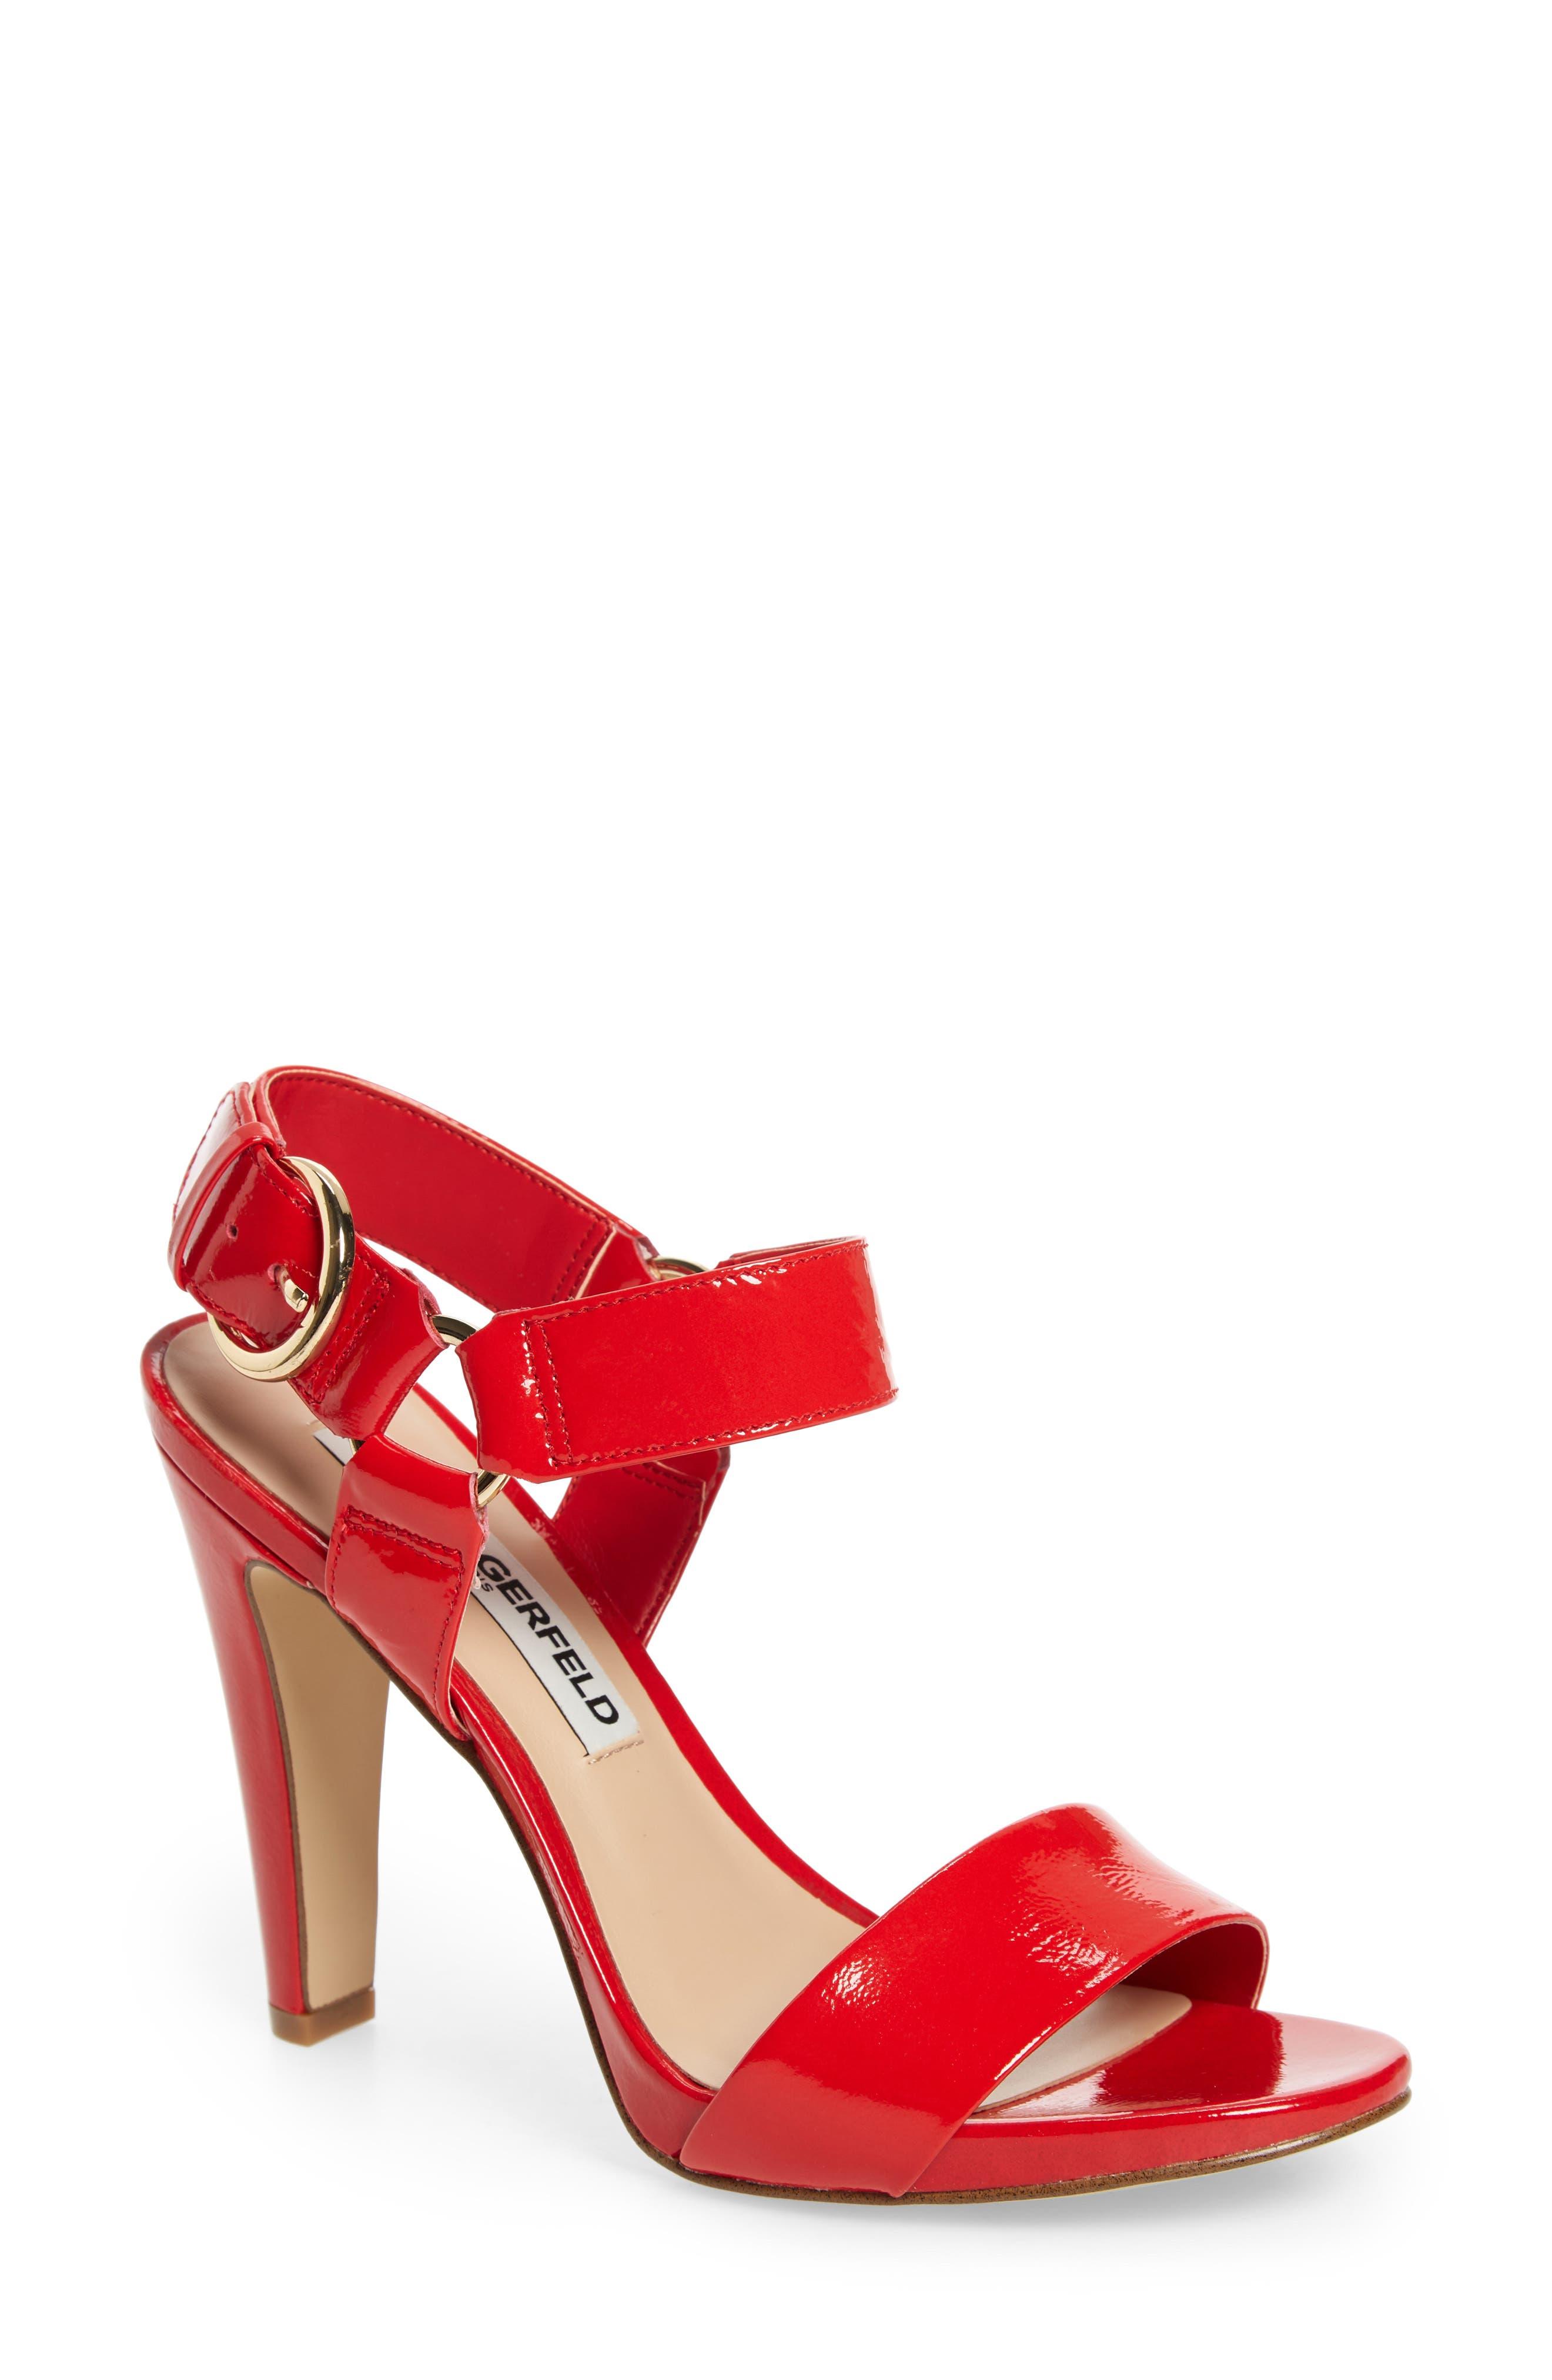 Karl Lagerfeld Paris Cieone Sandal- Red